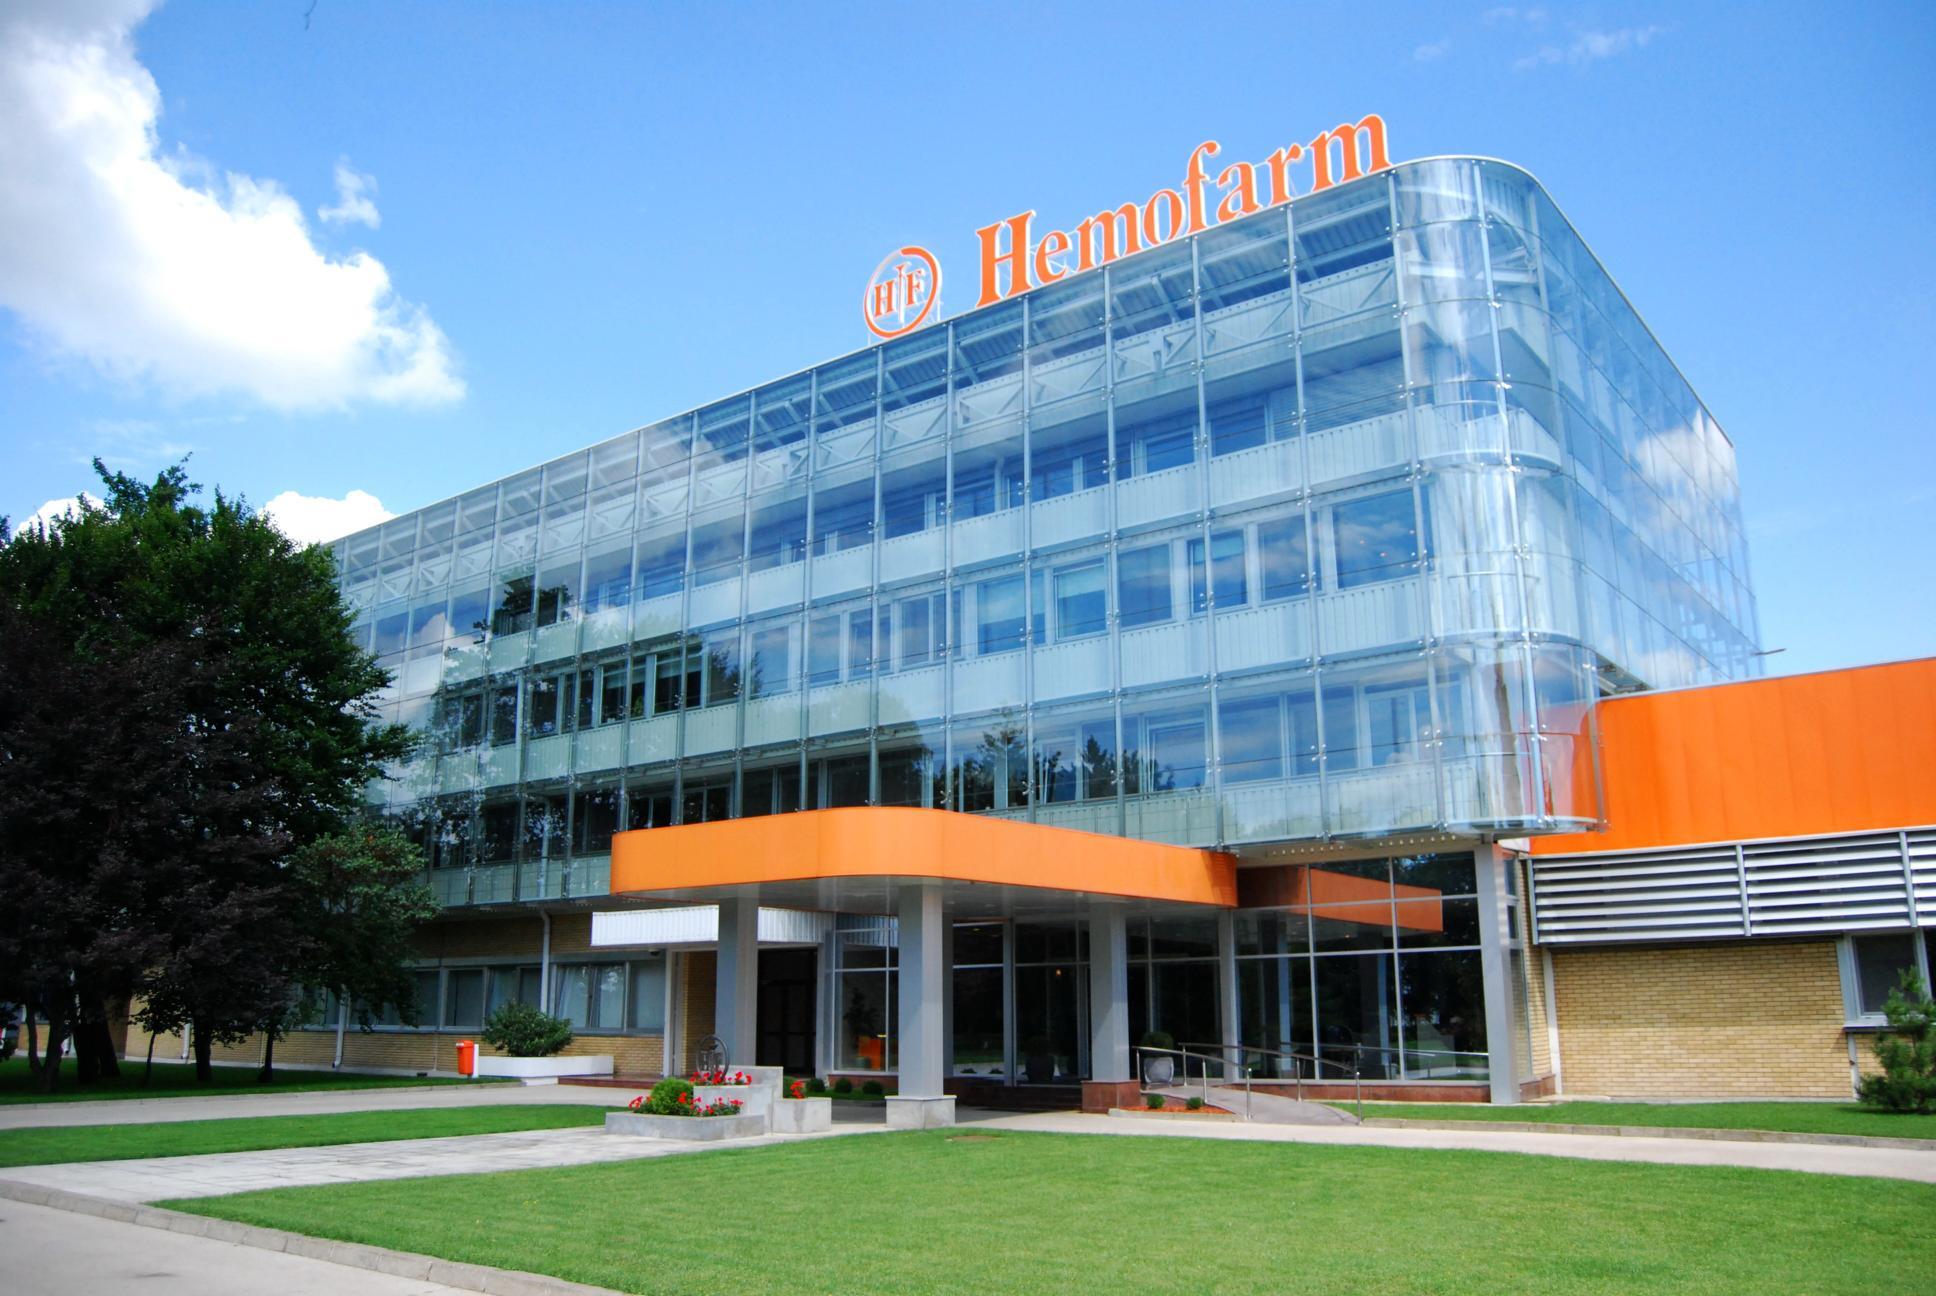 Serbia's Hemofarm opens quality control building